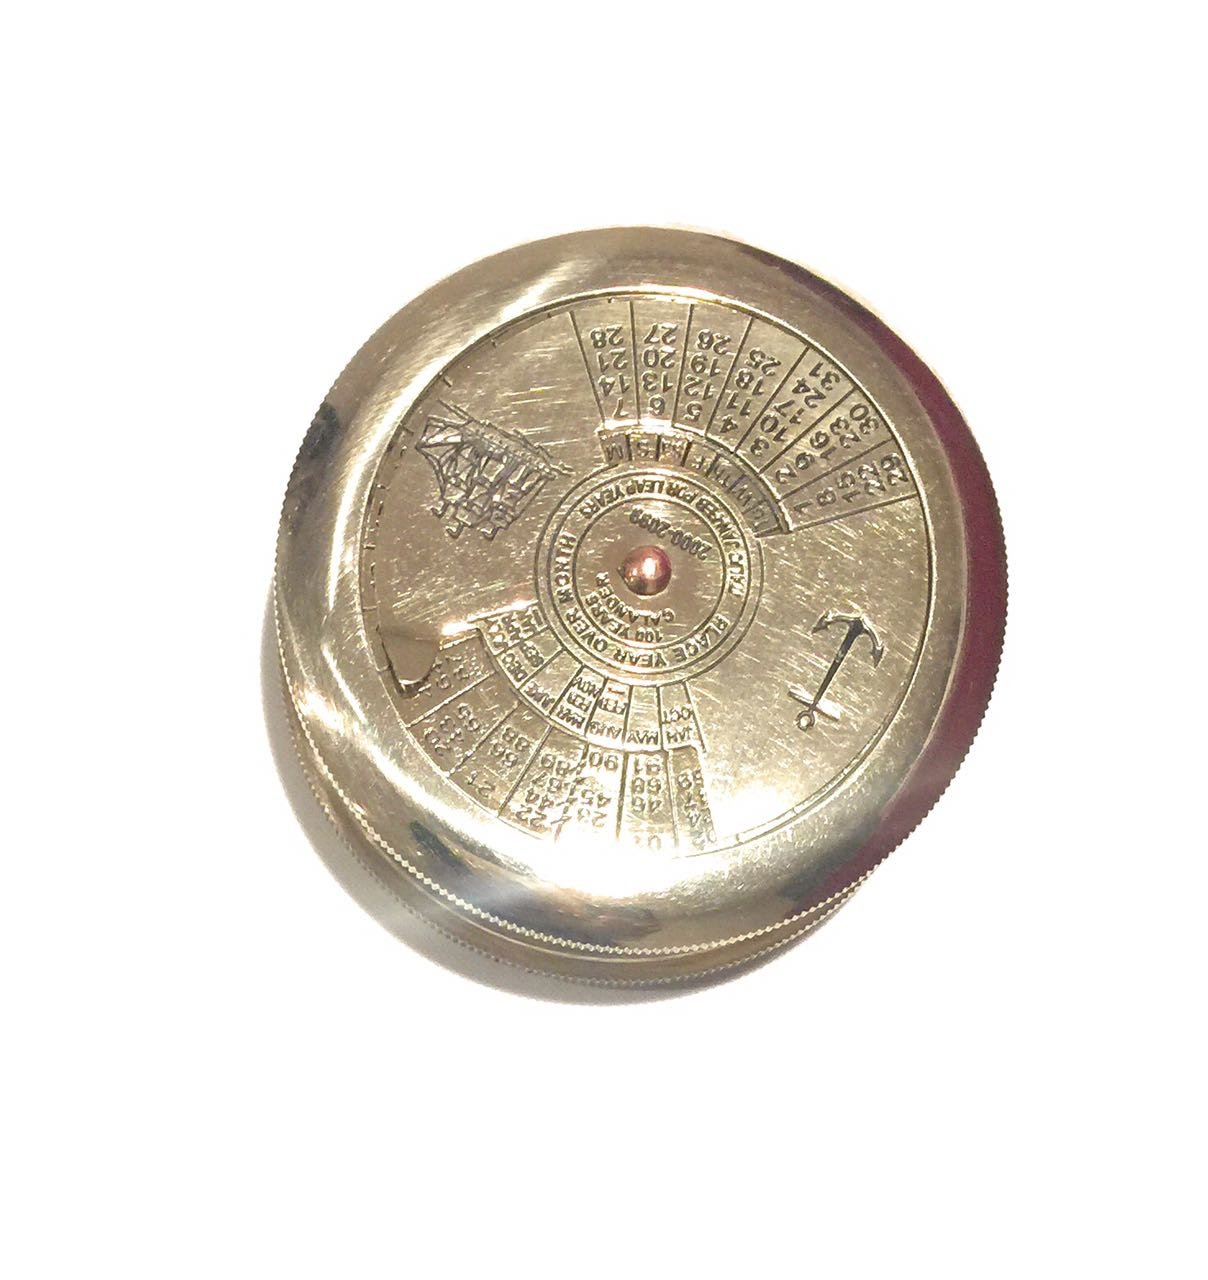 NAUTICALMART 100年CalenderコンパスMarine Collectibles B01K6R4ZSE